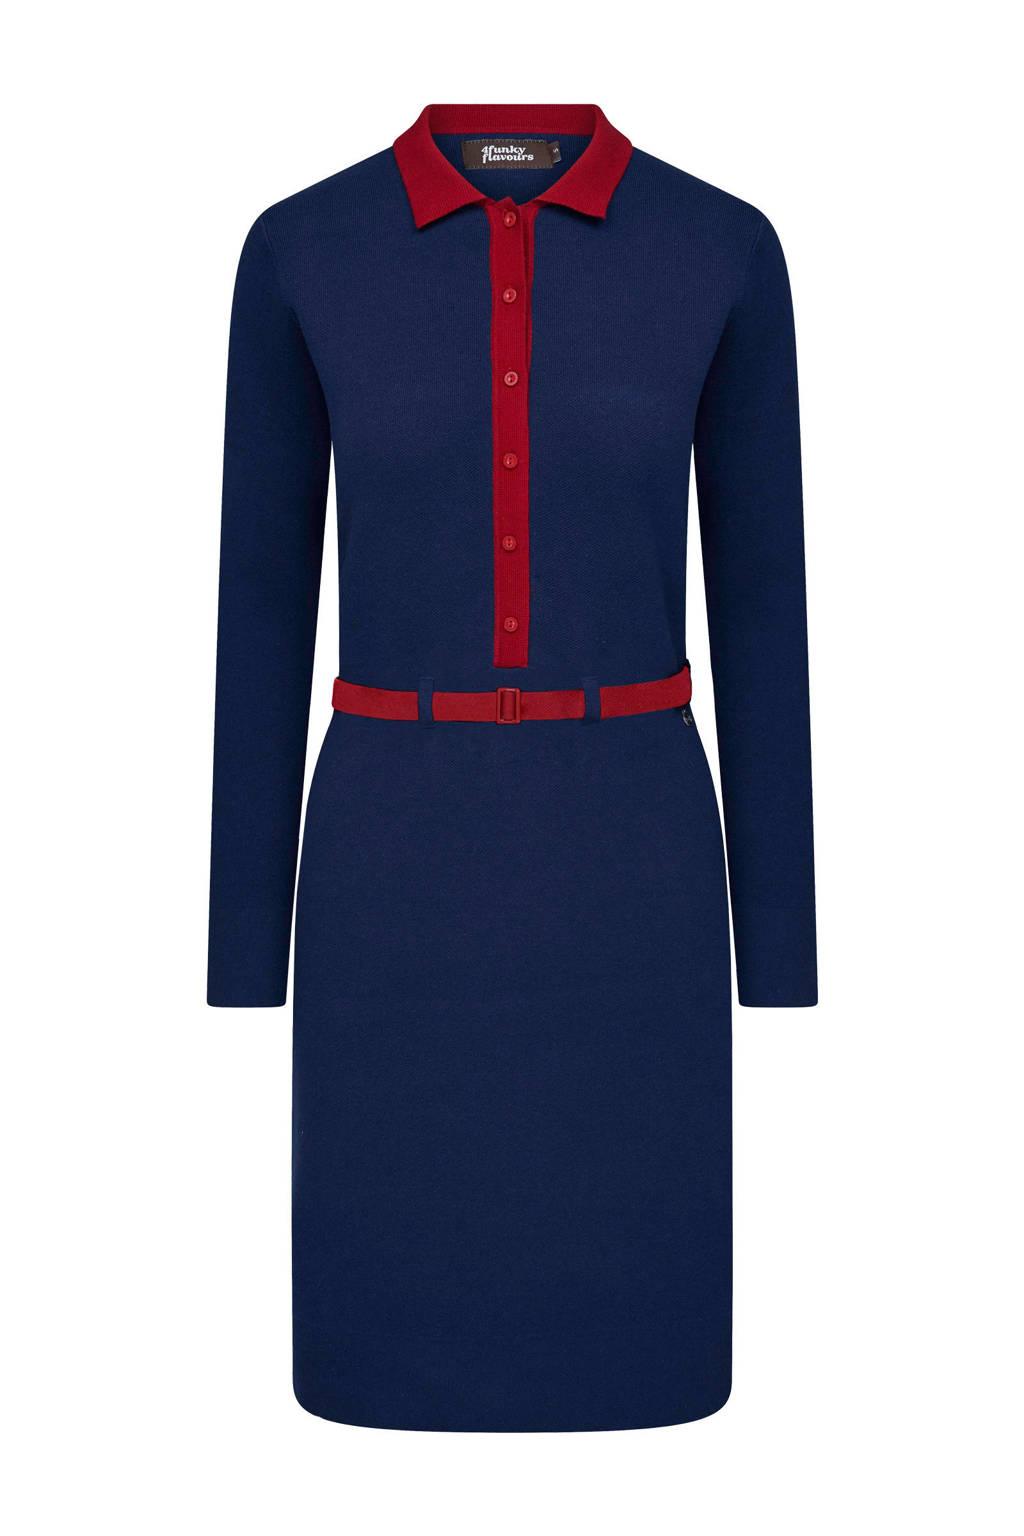 4funkyflavours fine knit jurk blauw, Blue Nights